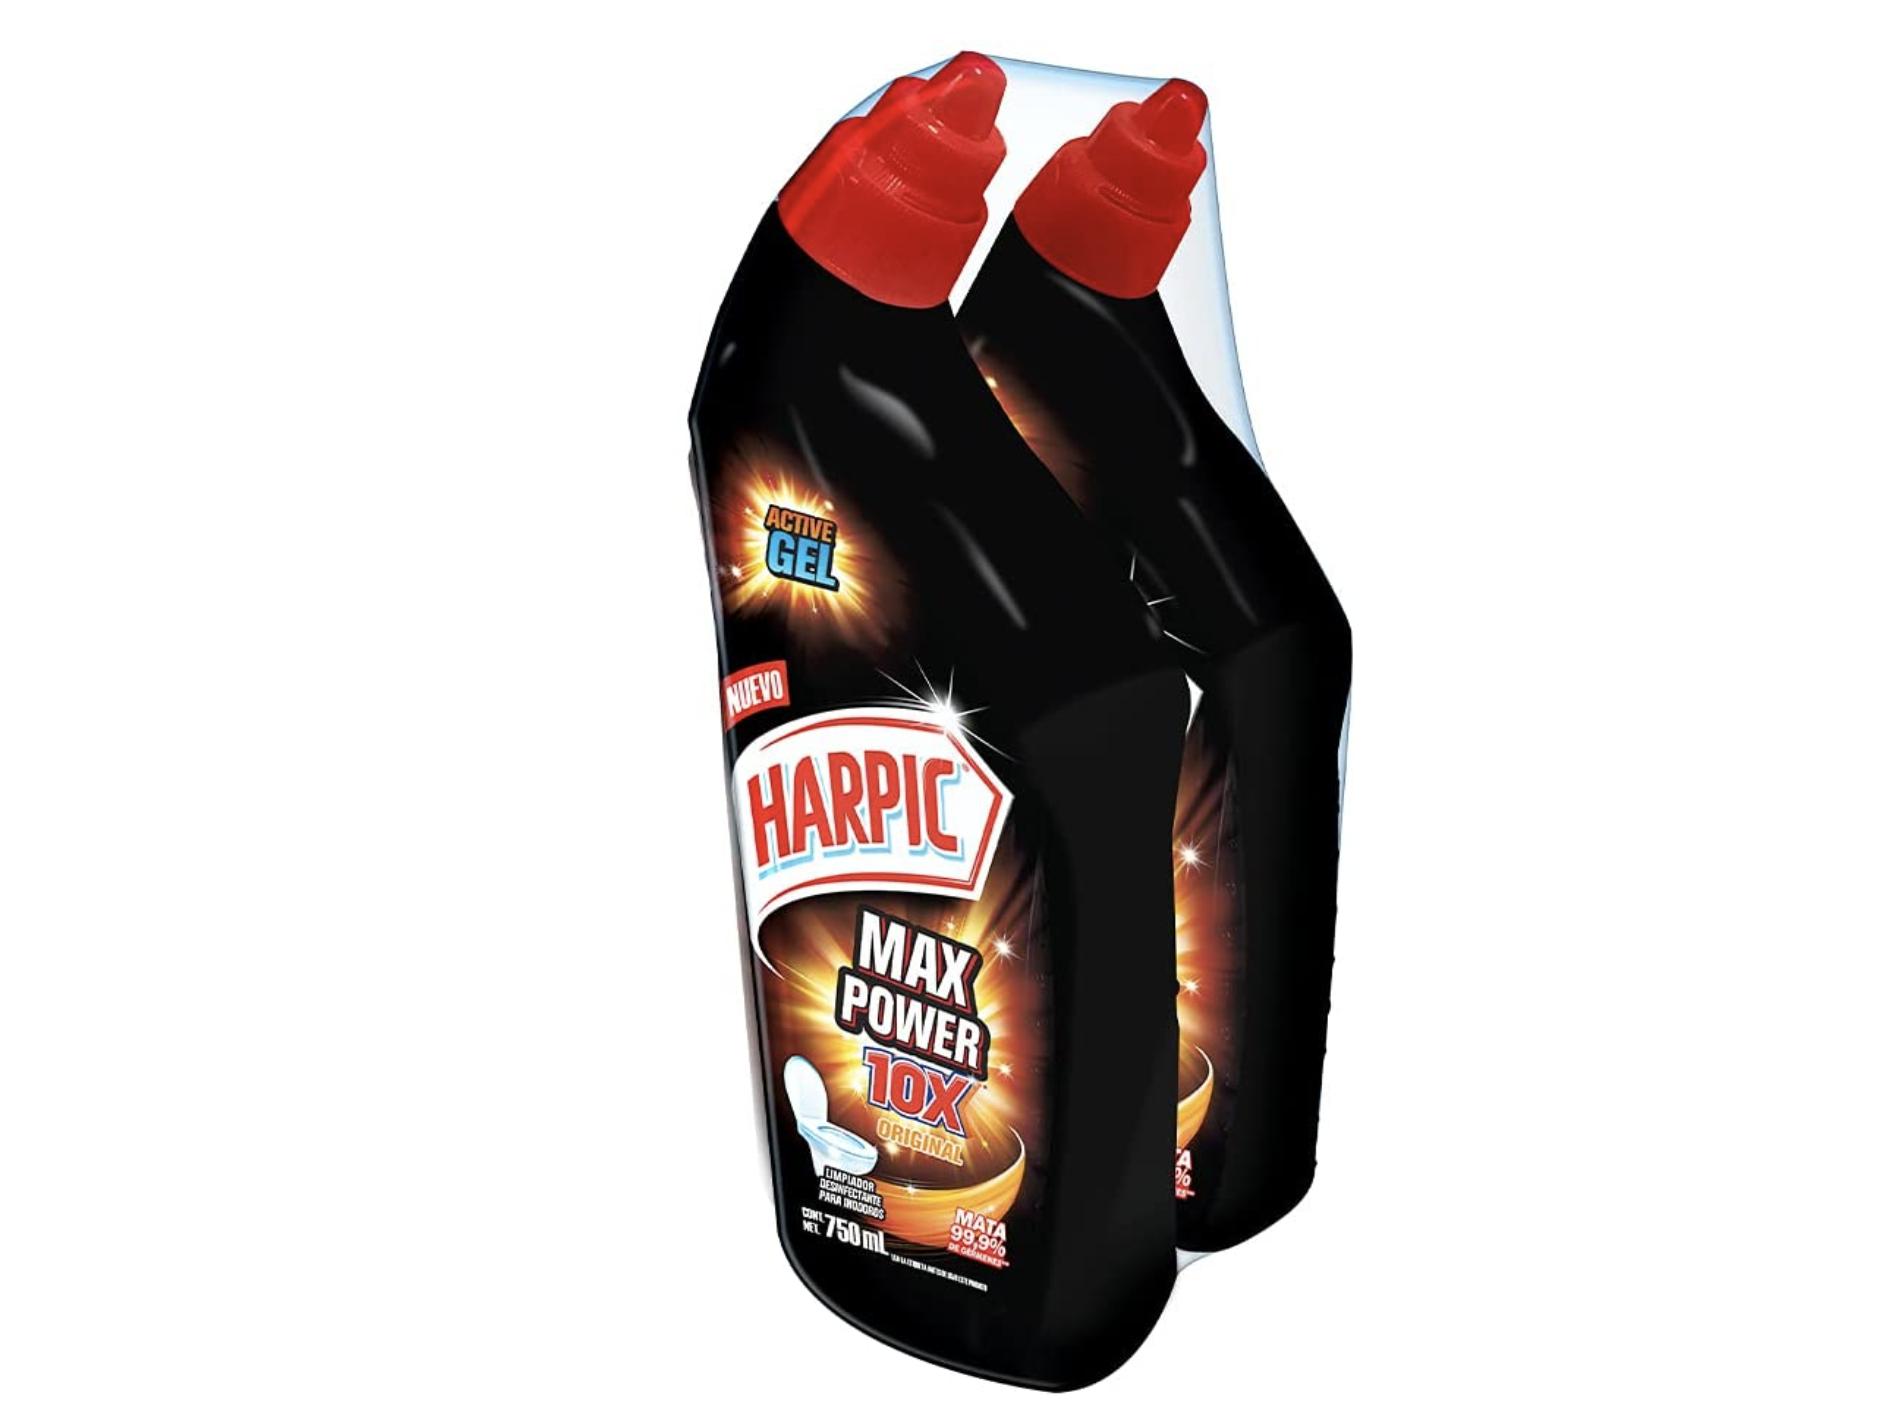 Paquete con dos limpiadores Harpic Max Power